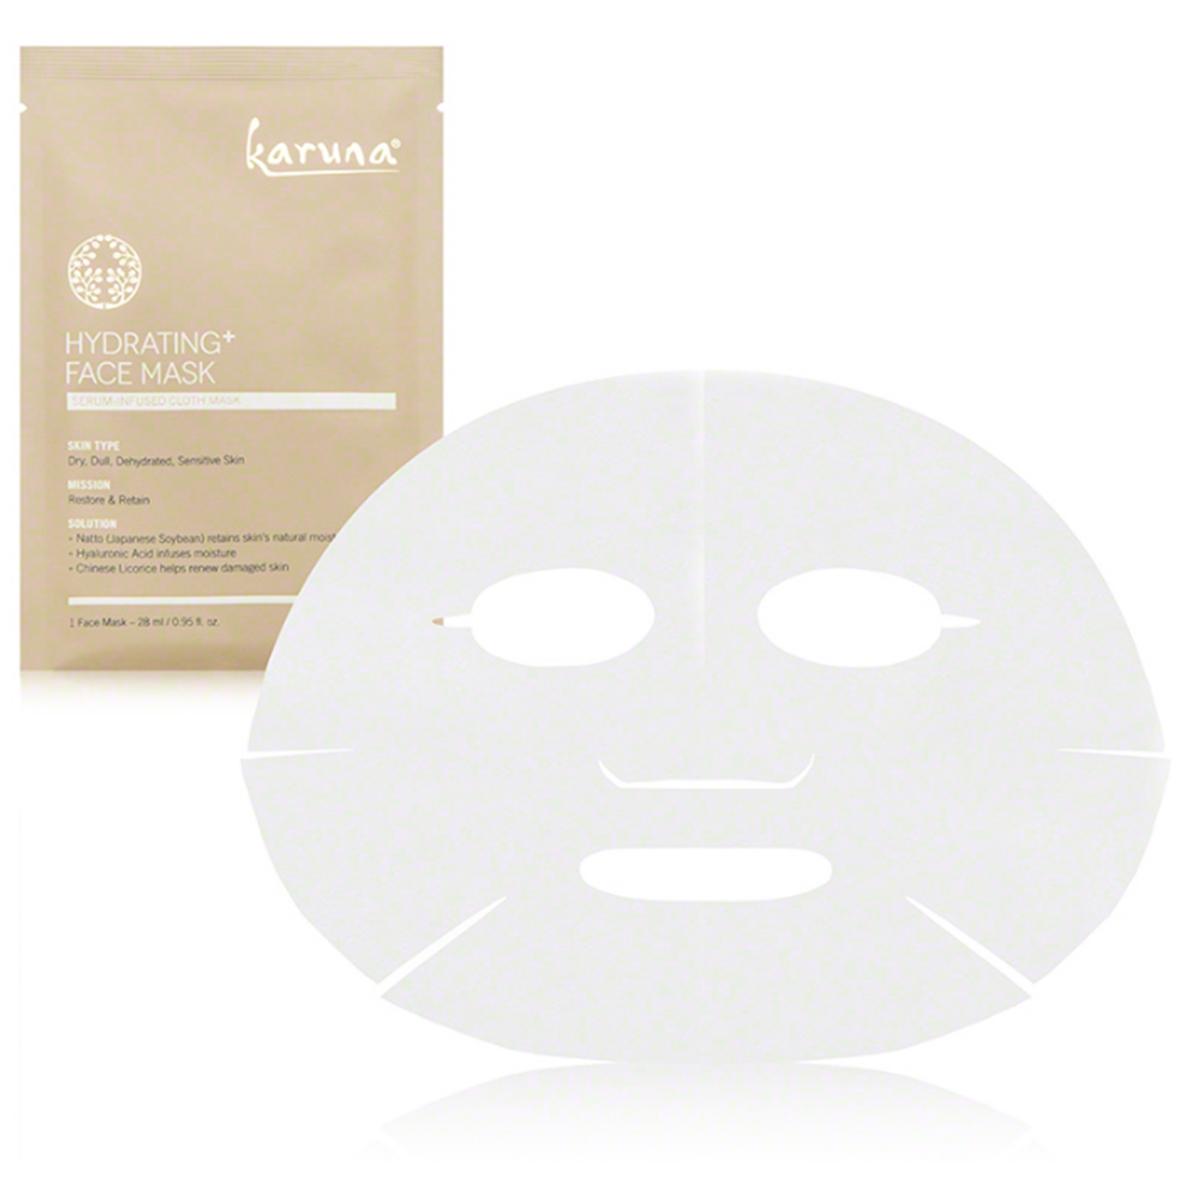 karuna mask